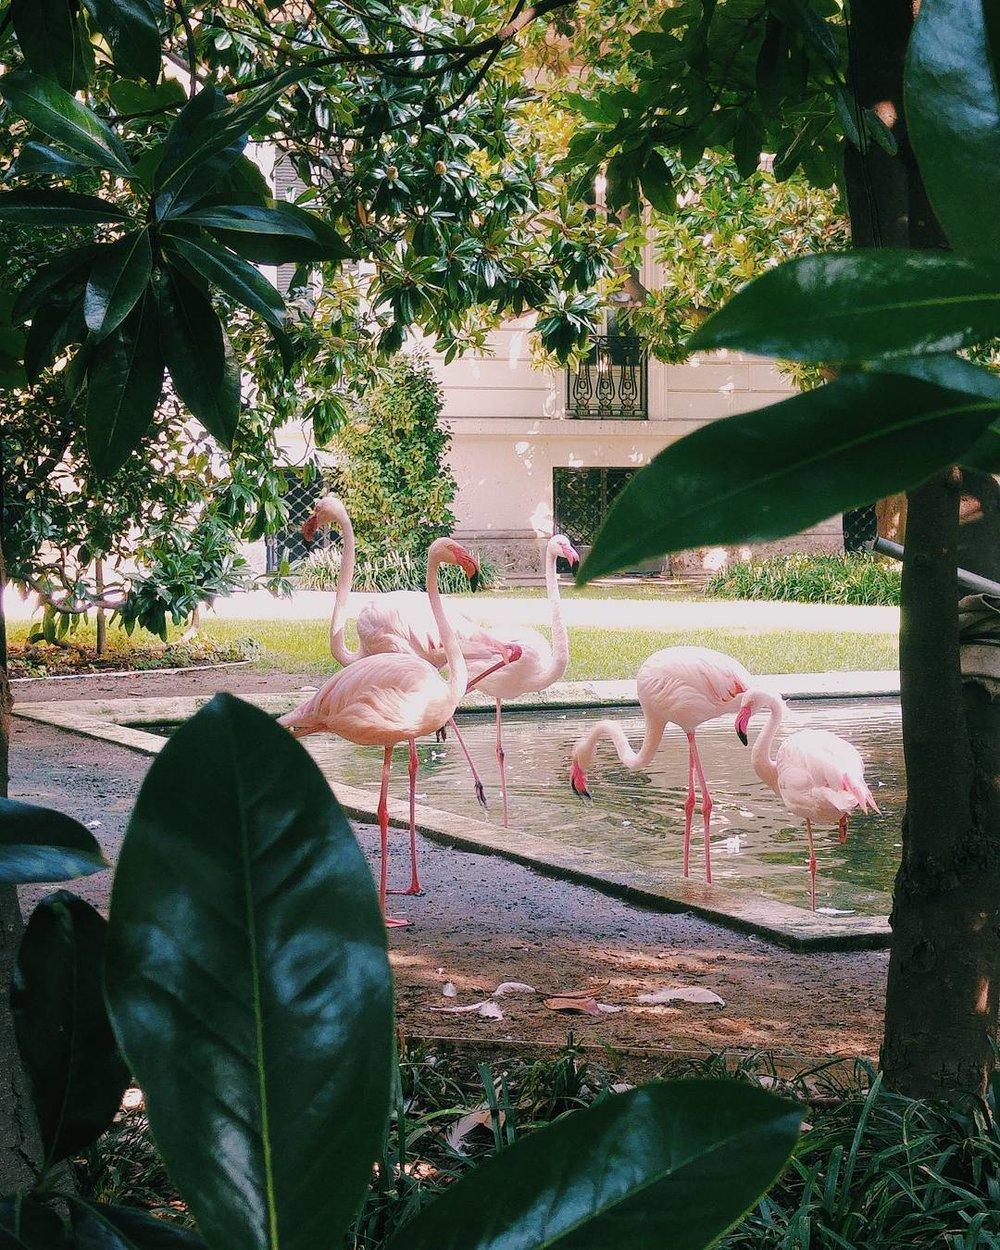 Villa_Invernizzi_milan_martinaacorradi.jpg